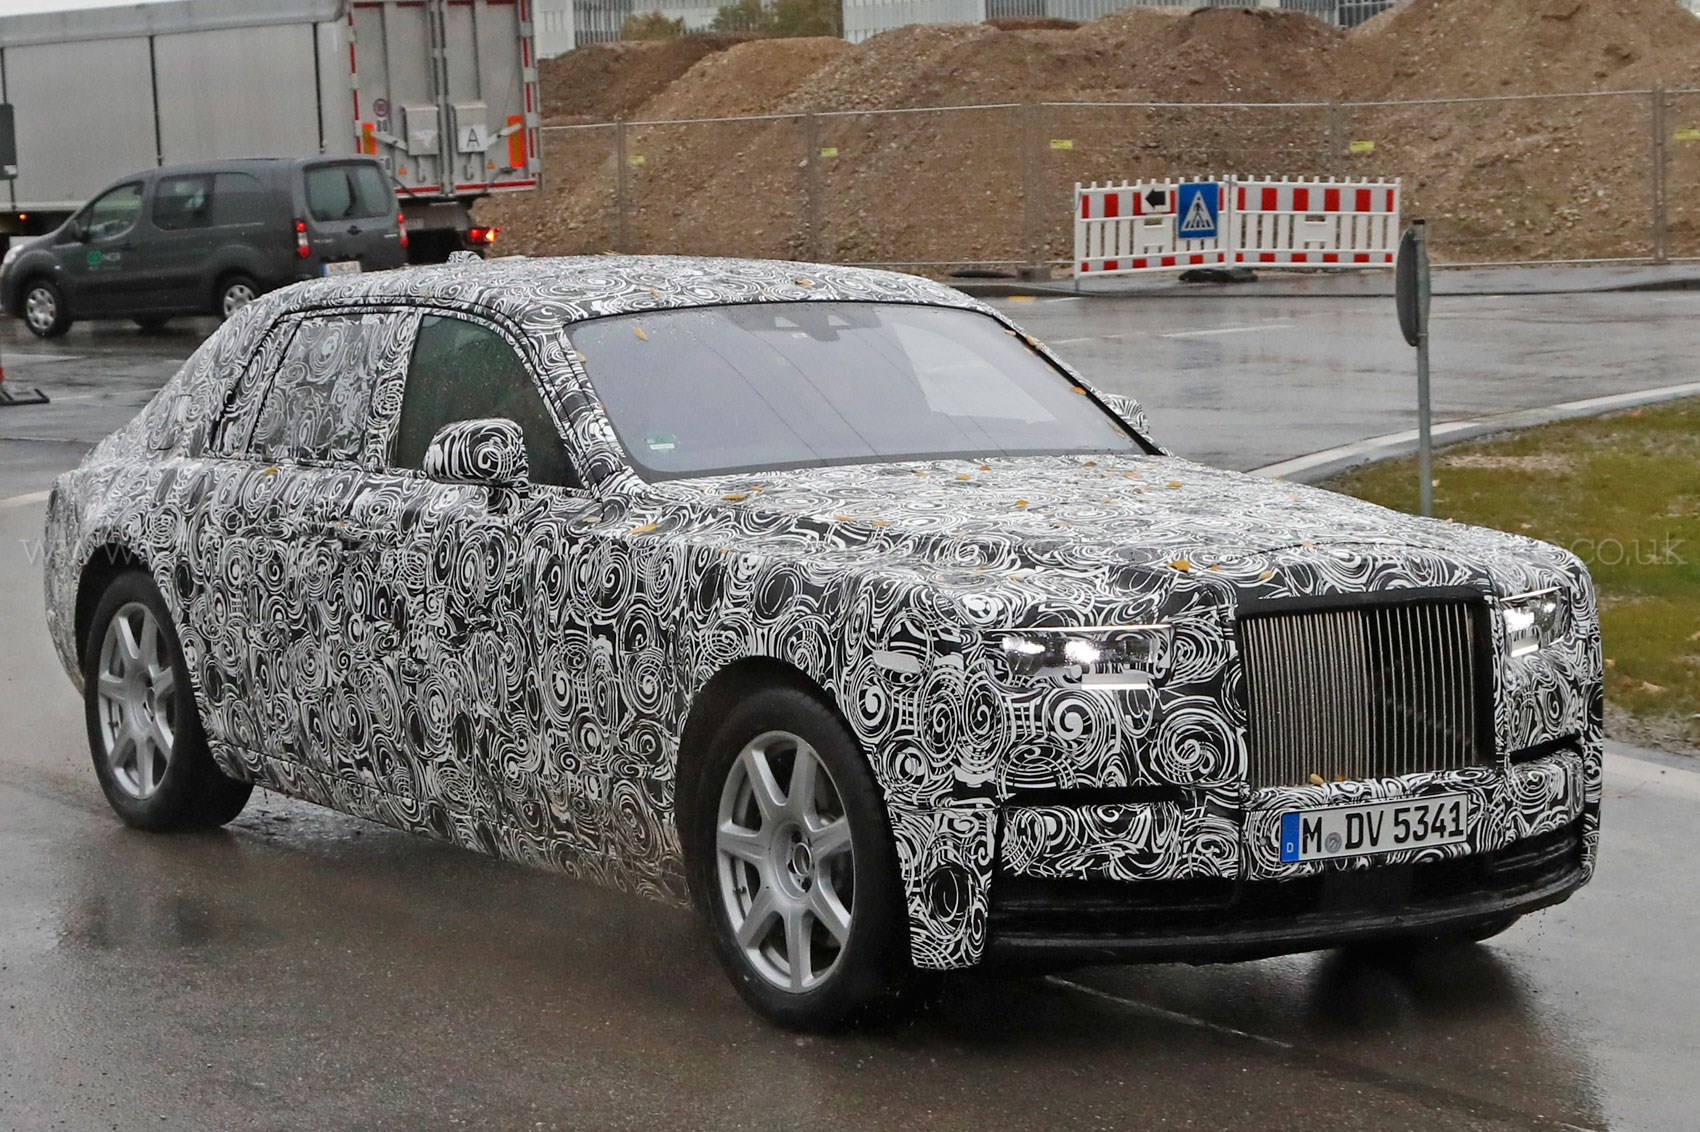 Next Gen Rolls Royce Phantom Spotted Car Magazine